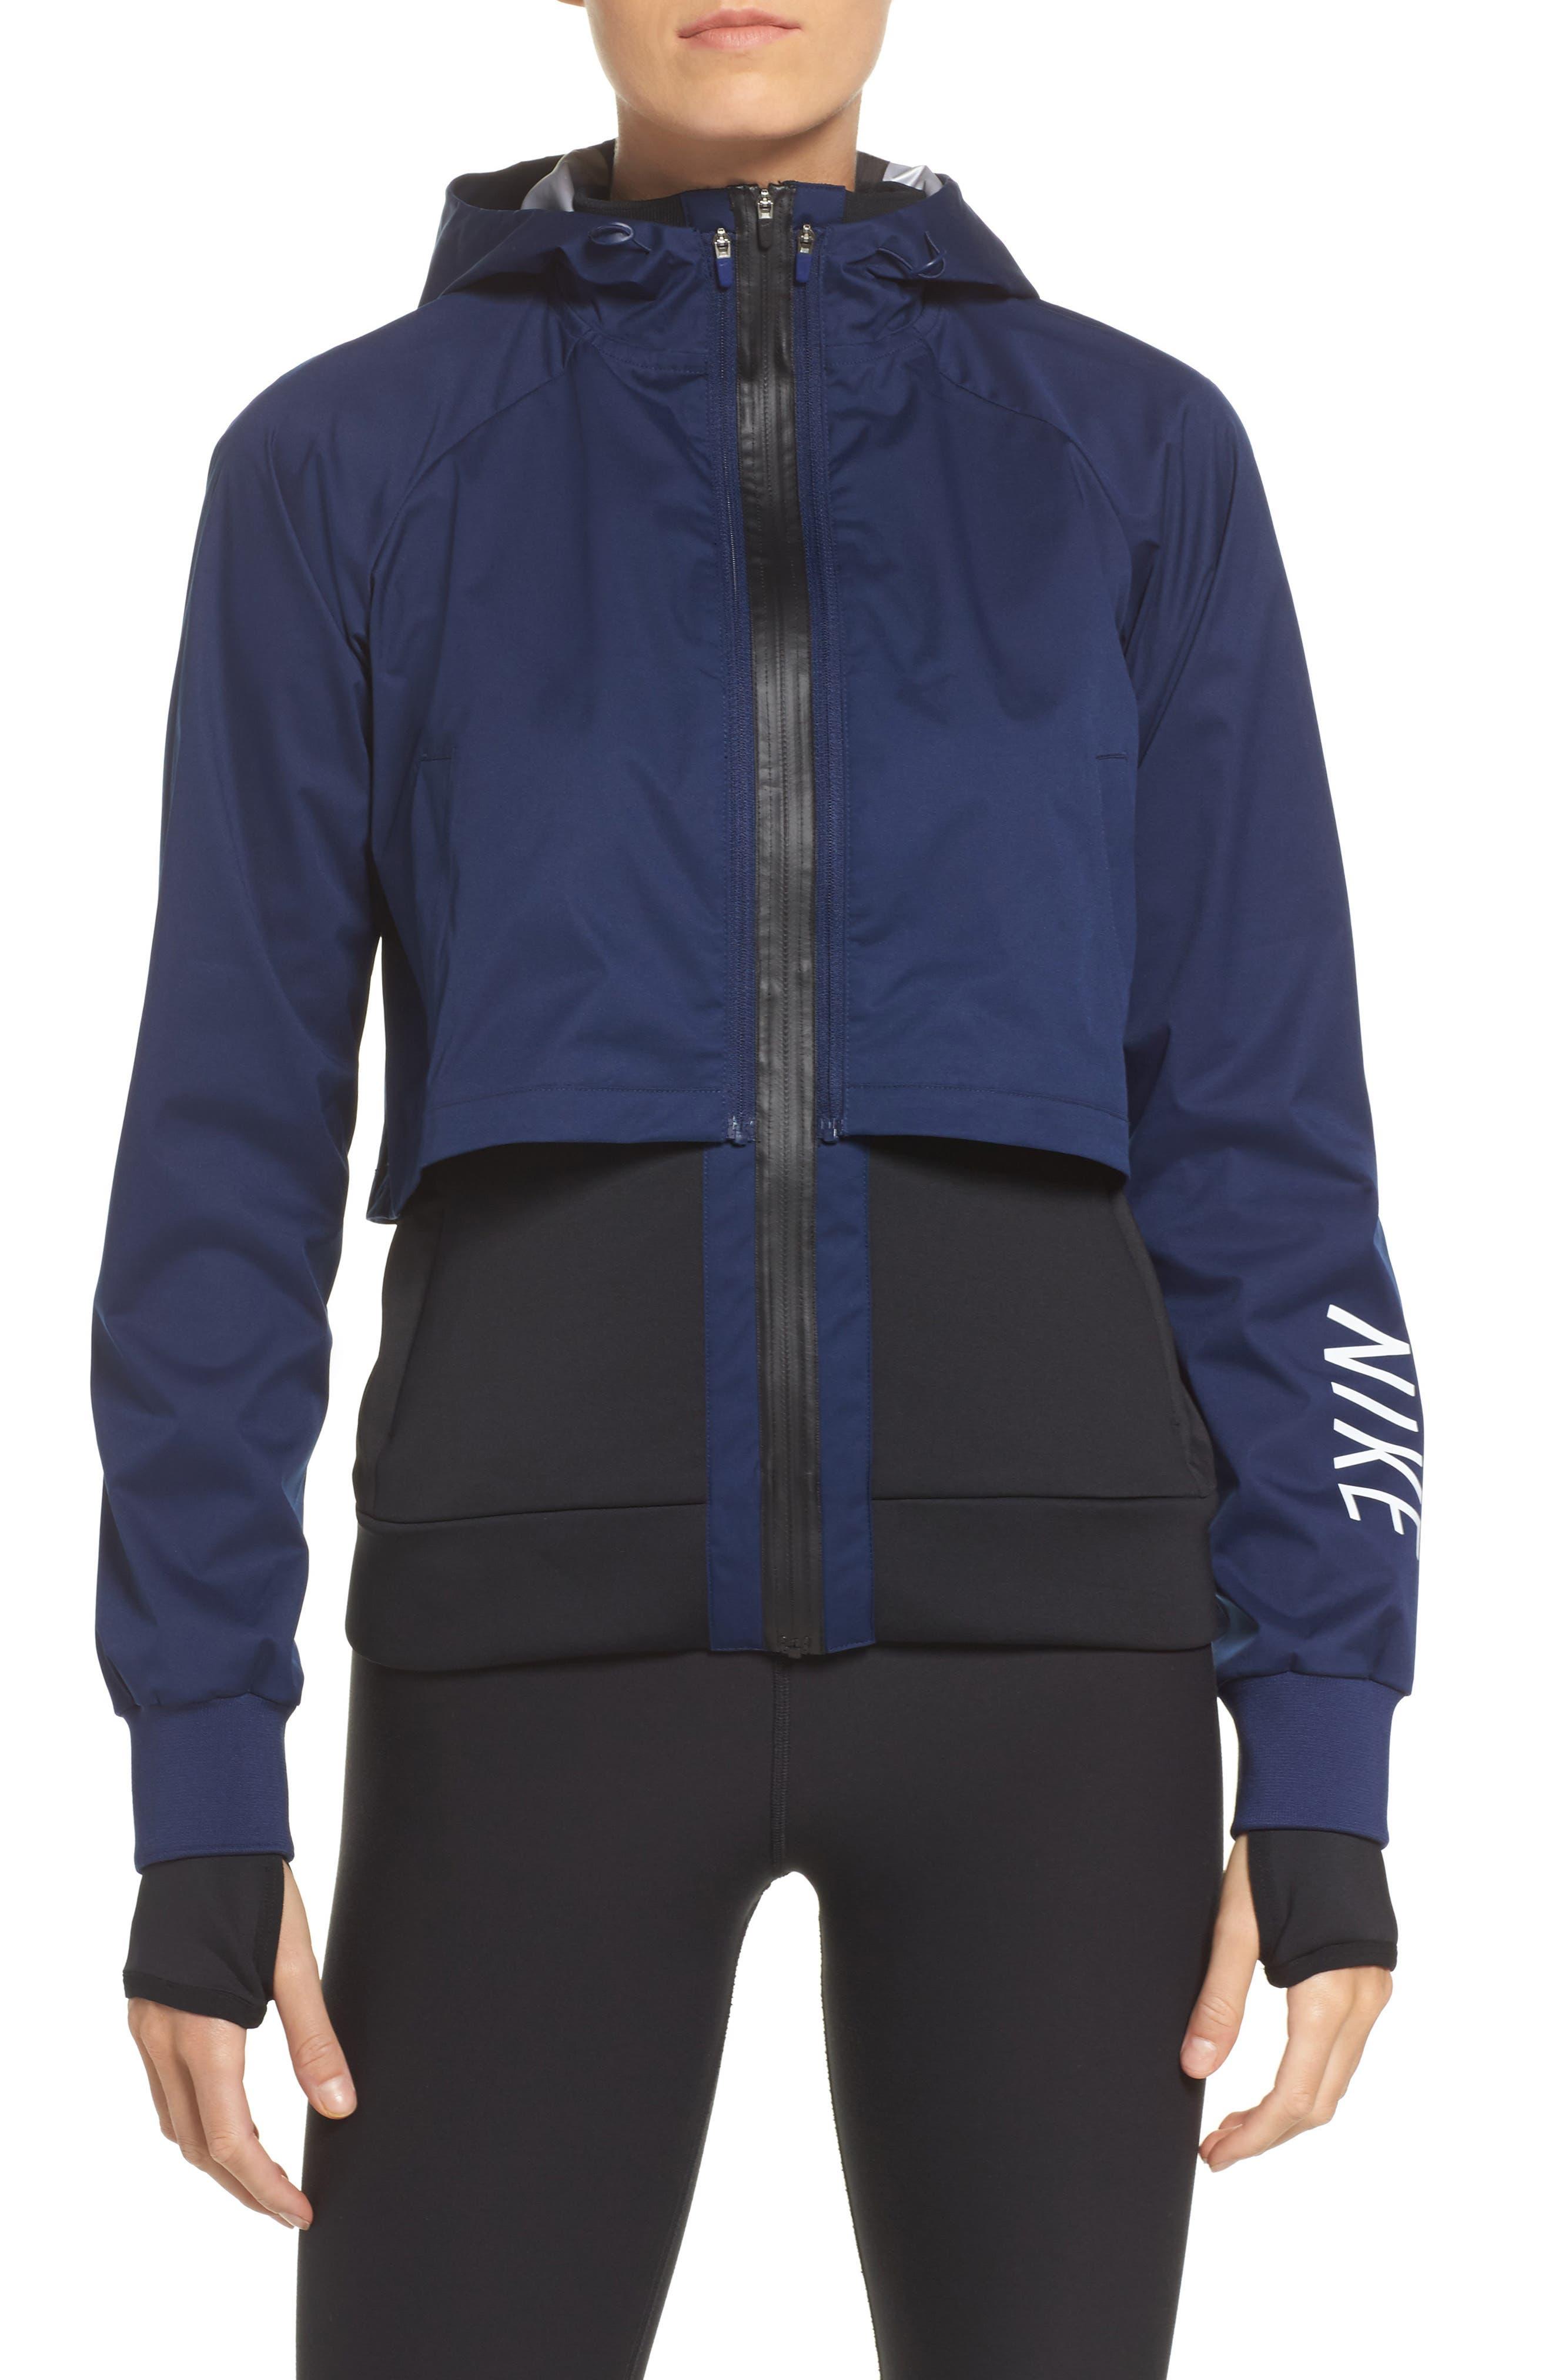 Main Image - Nike Therma Shield 2-in-1 Training Jacket